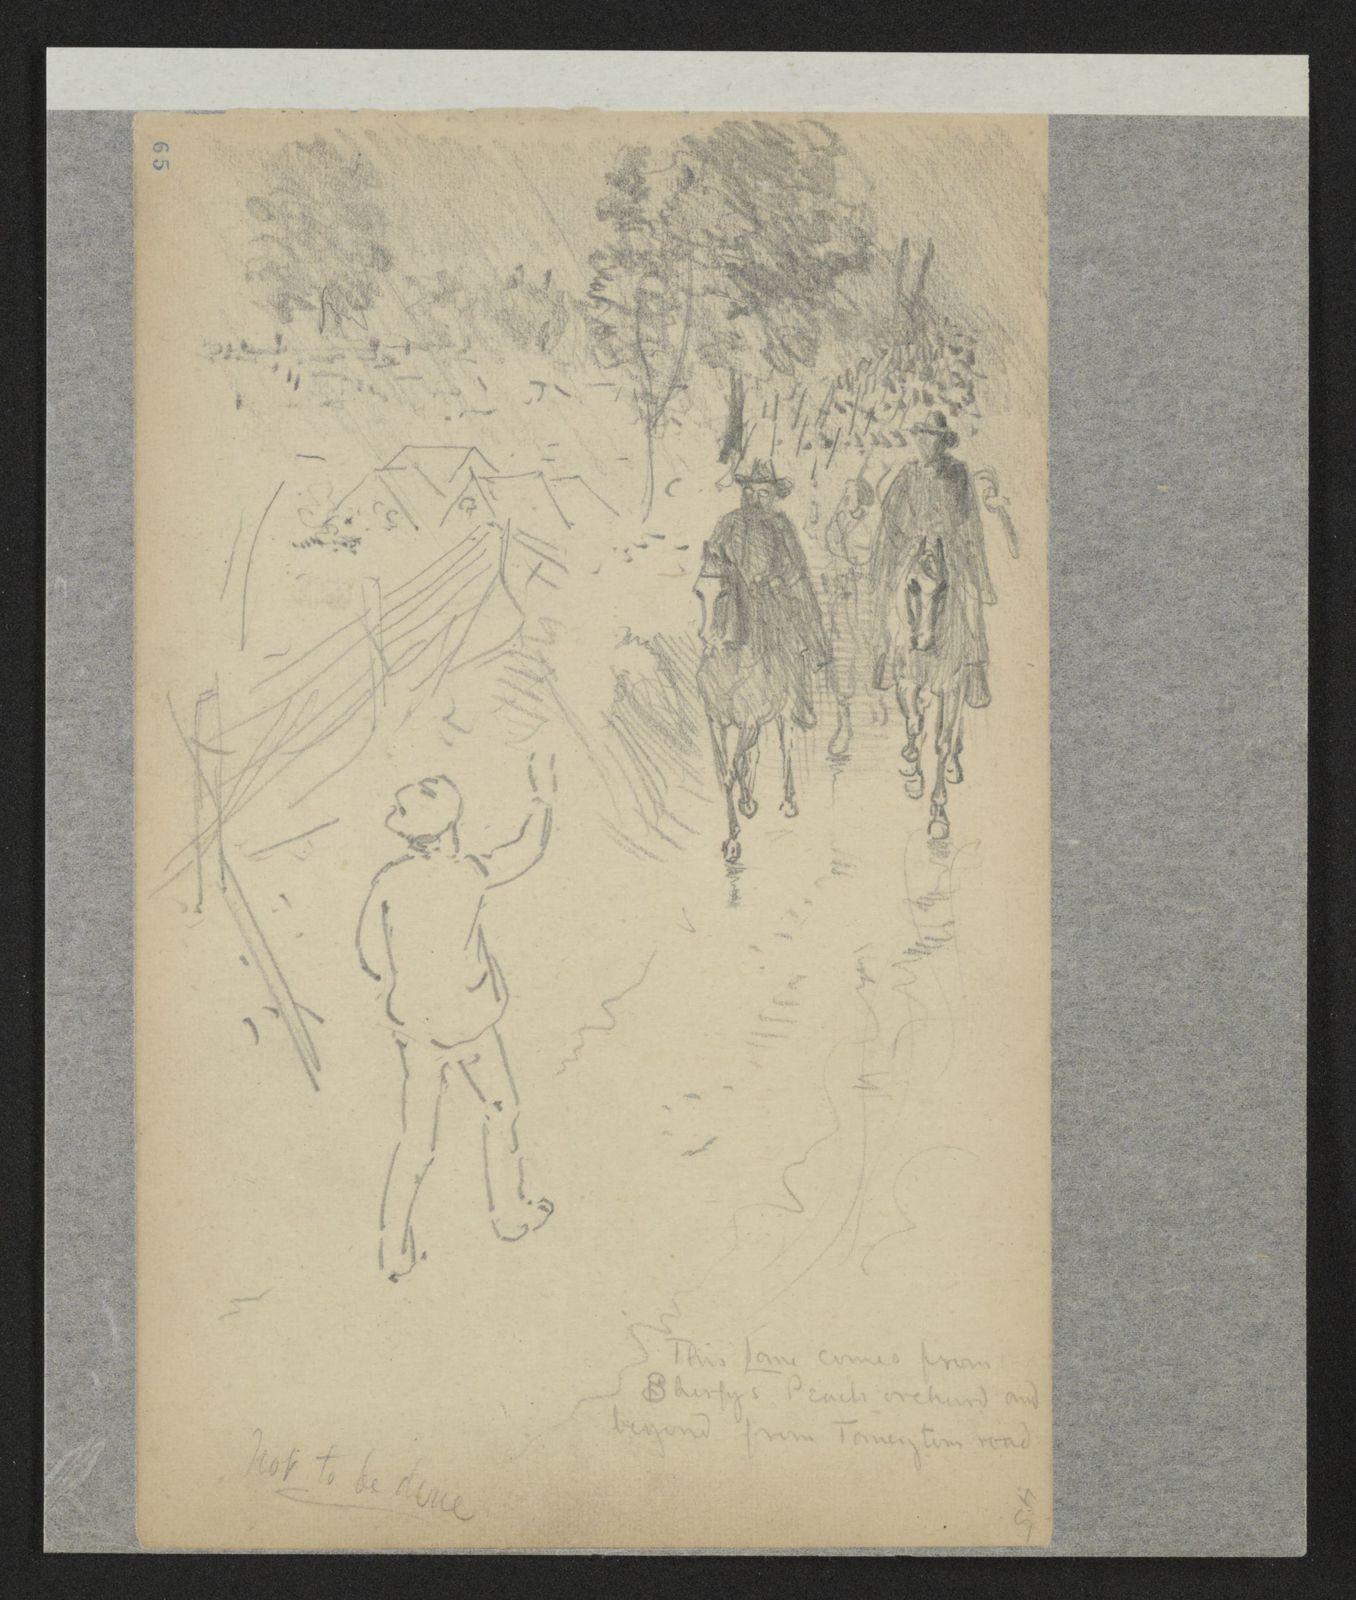 Charles Wellington Reed Papers: Sketchbooks, 1863-1887, undated; Nos. 1-10, leaves 1-415